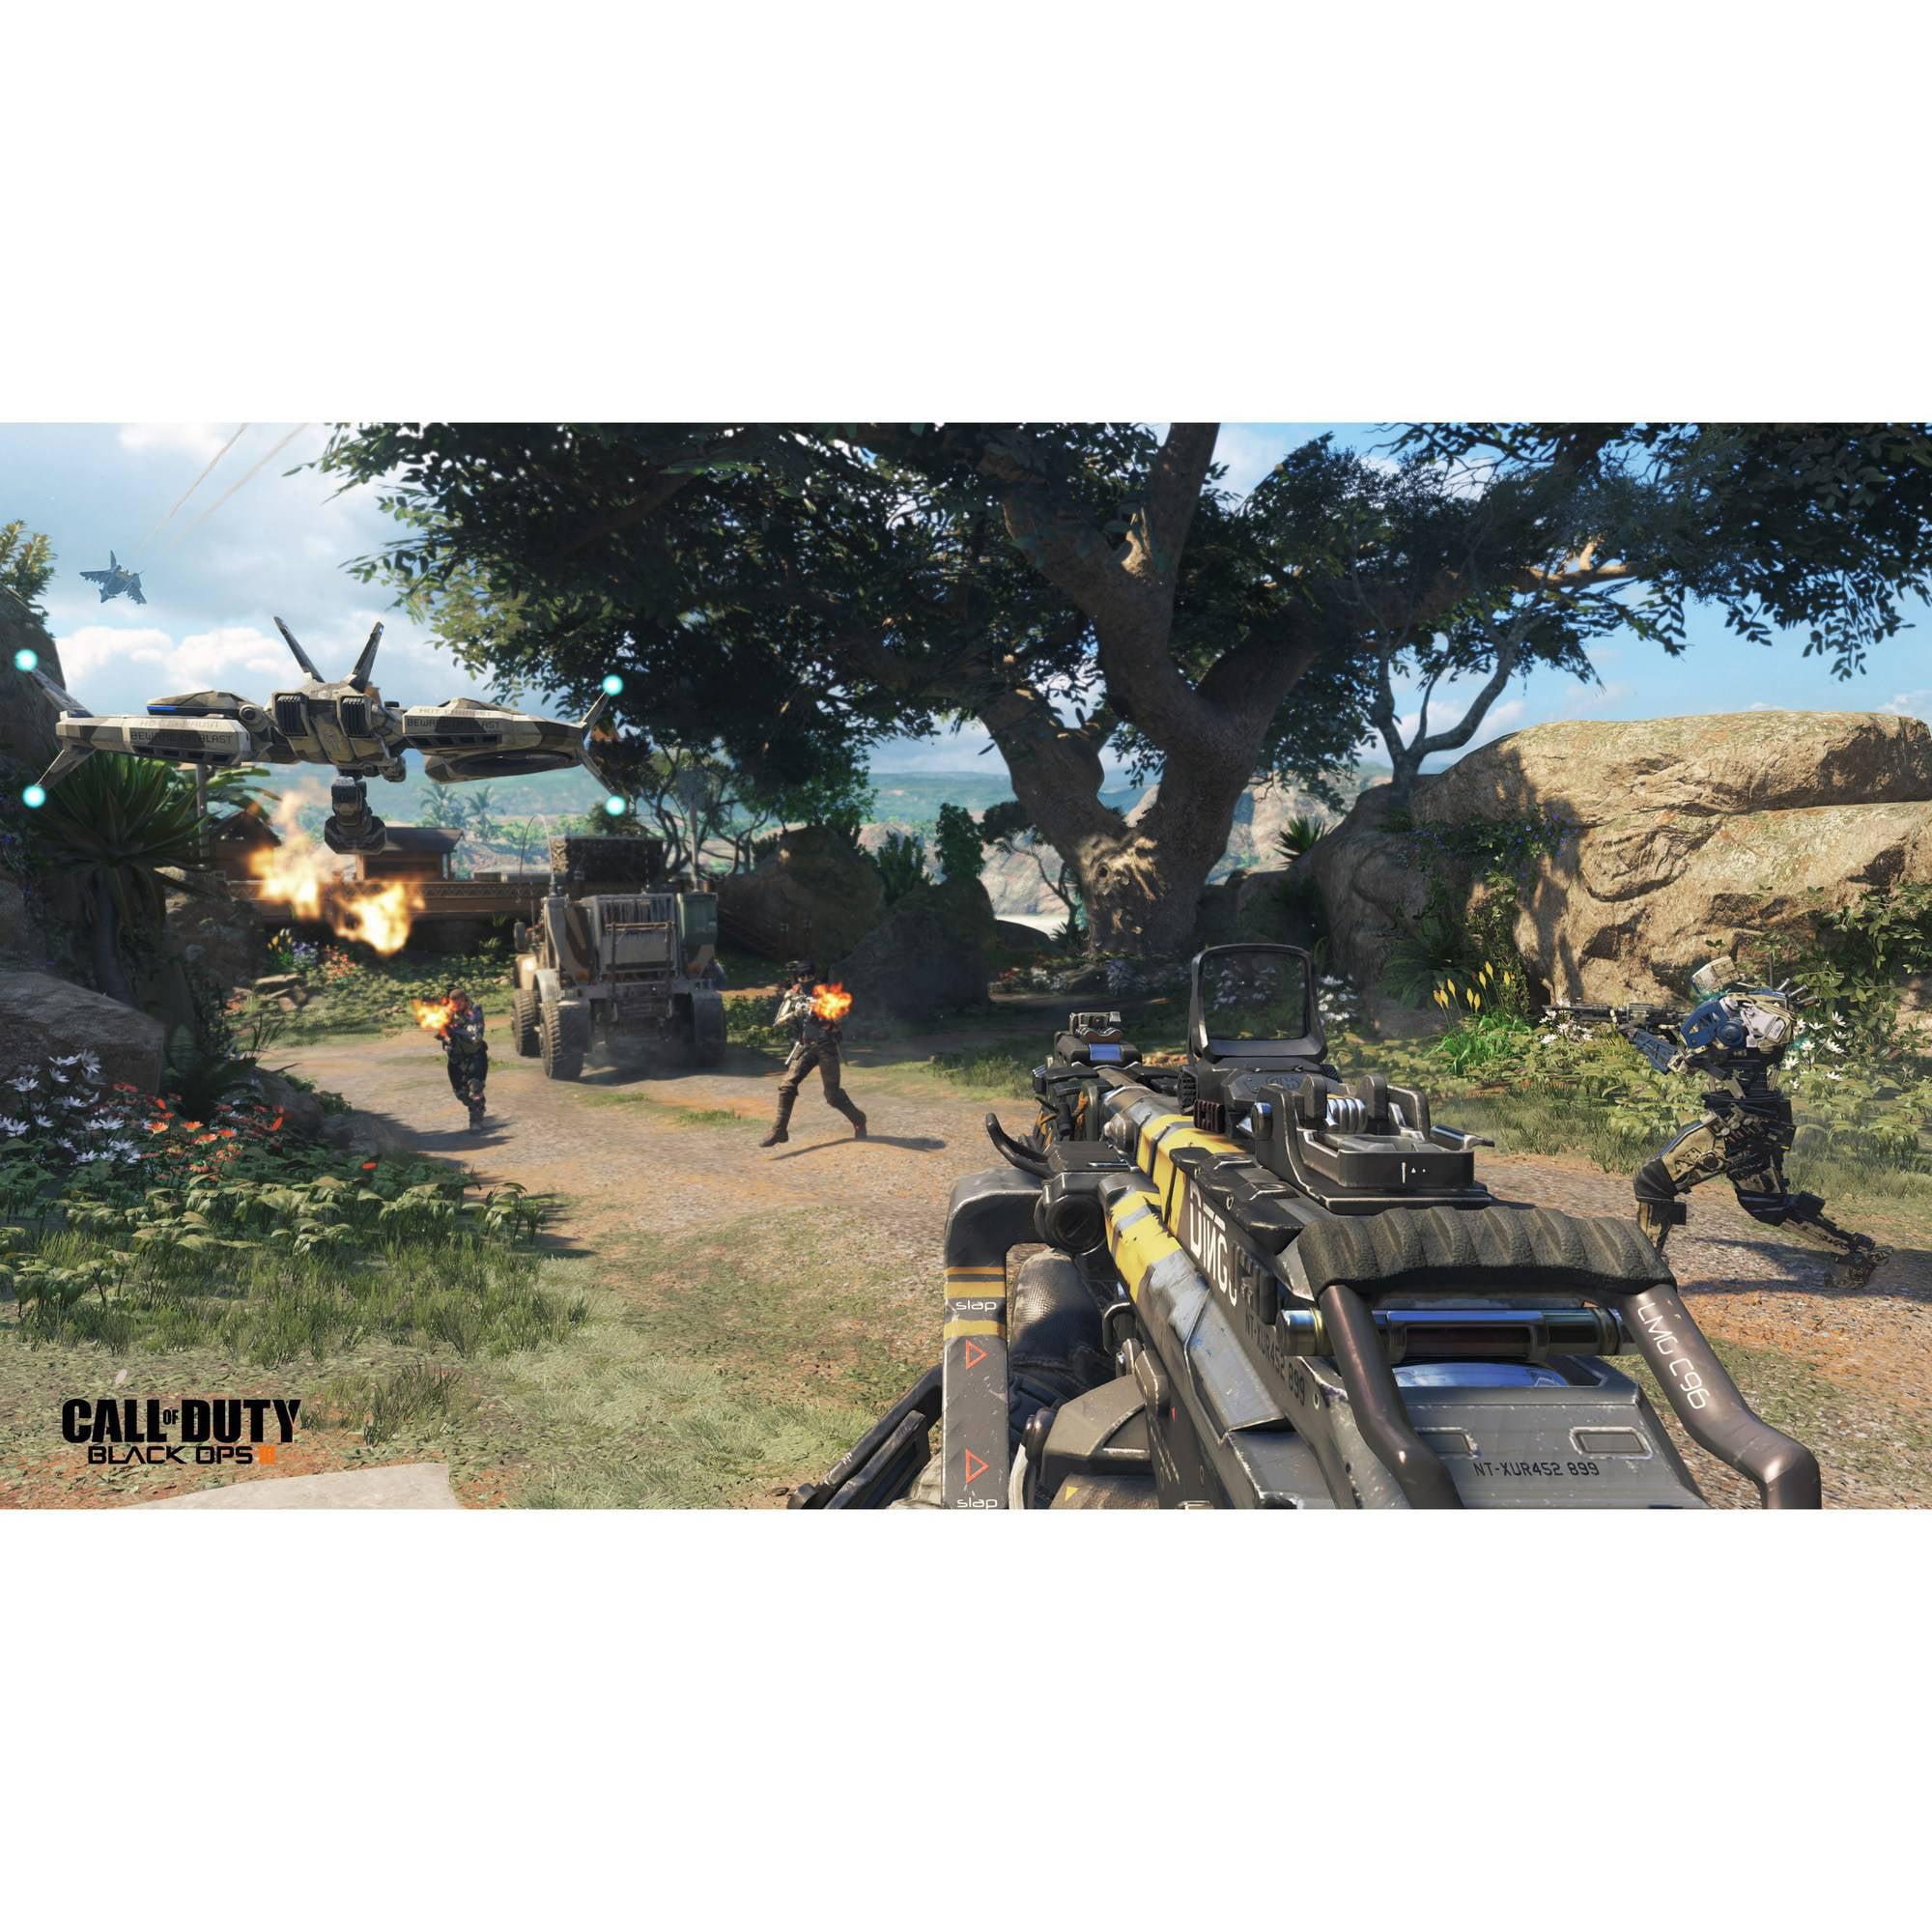 Call Of Duty Black Ops 3 Activision Xbox One 047875874664 Walmart Com Walmart Com